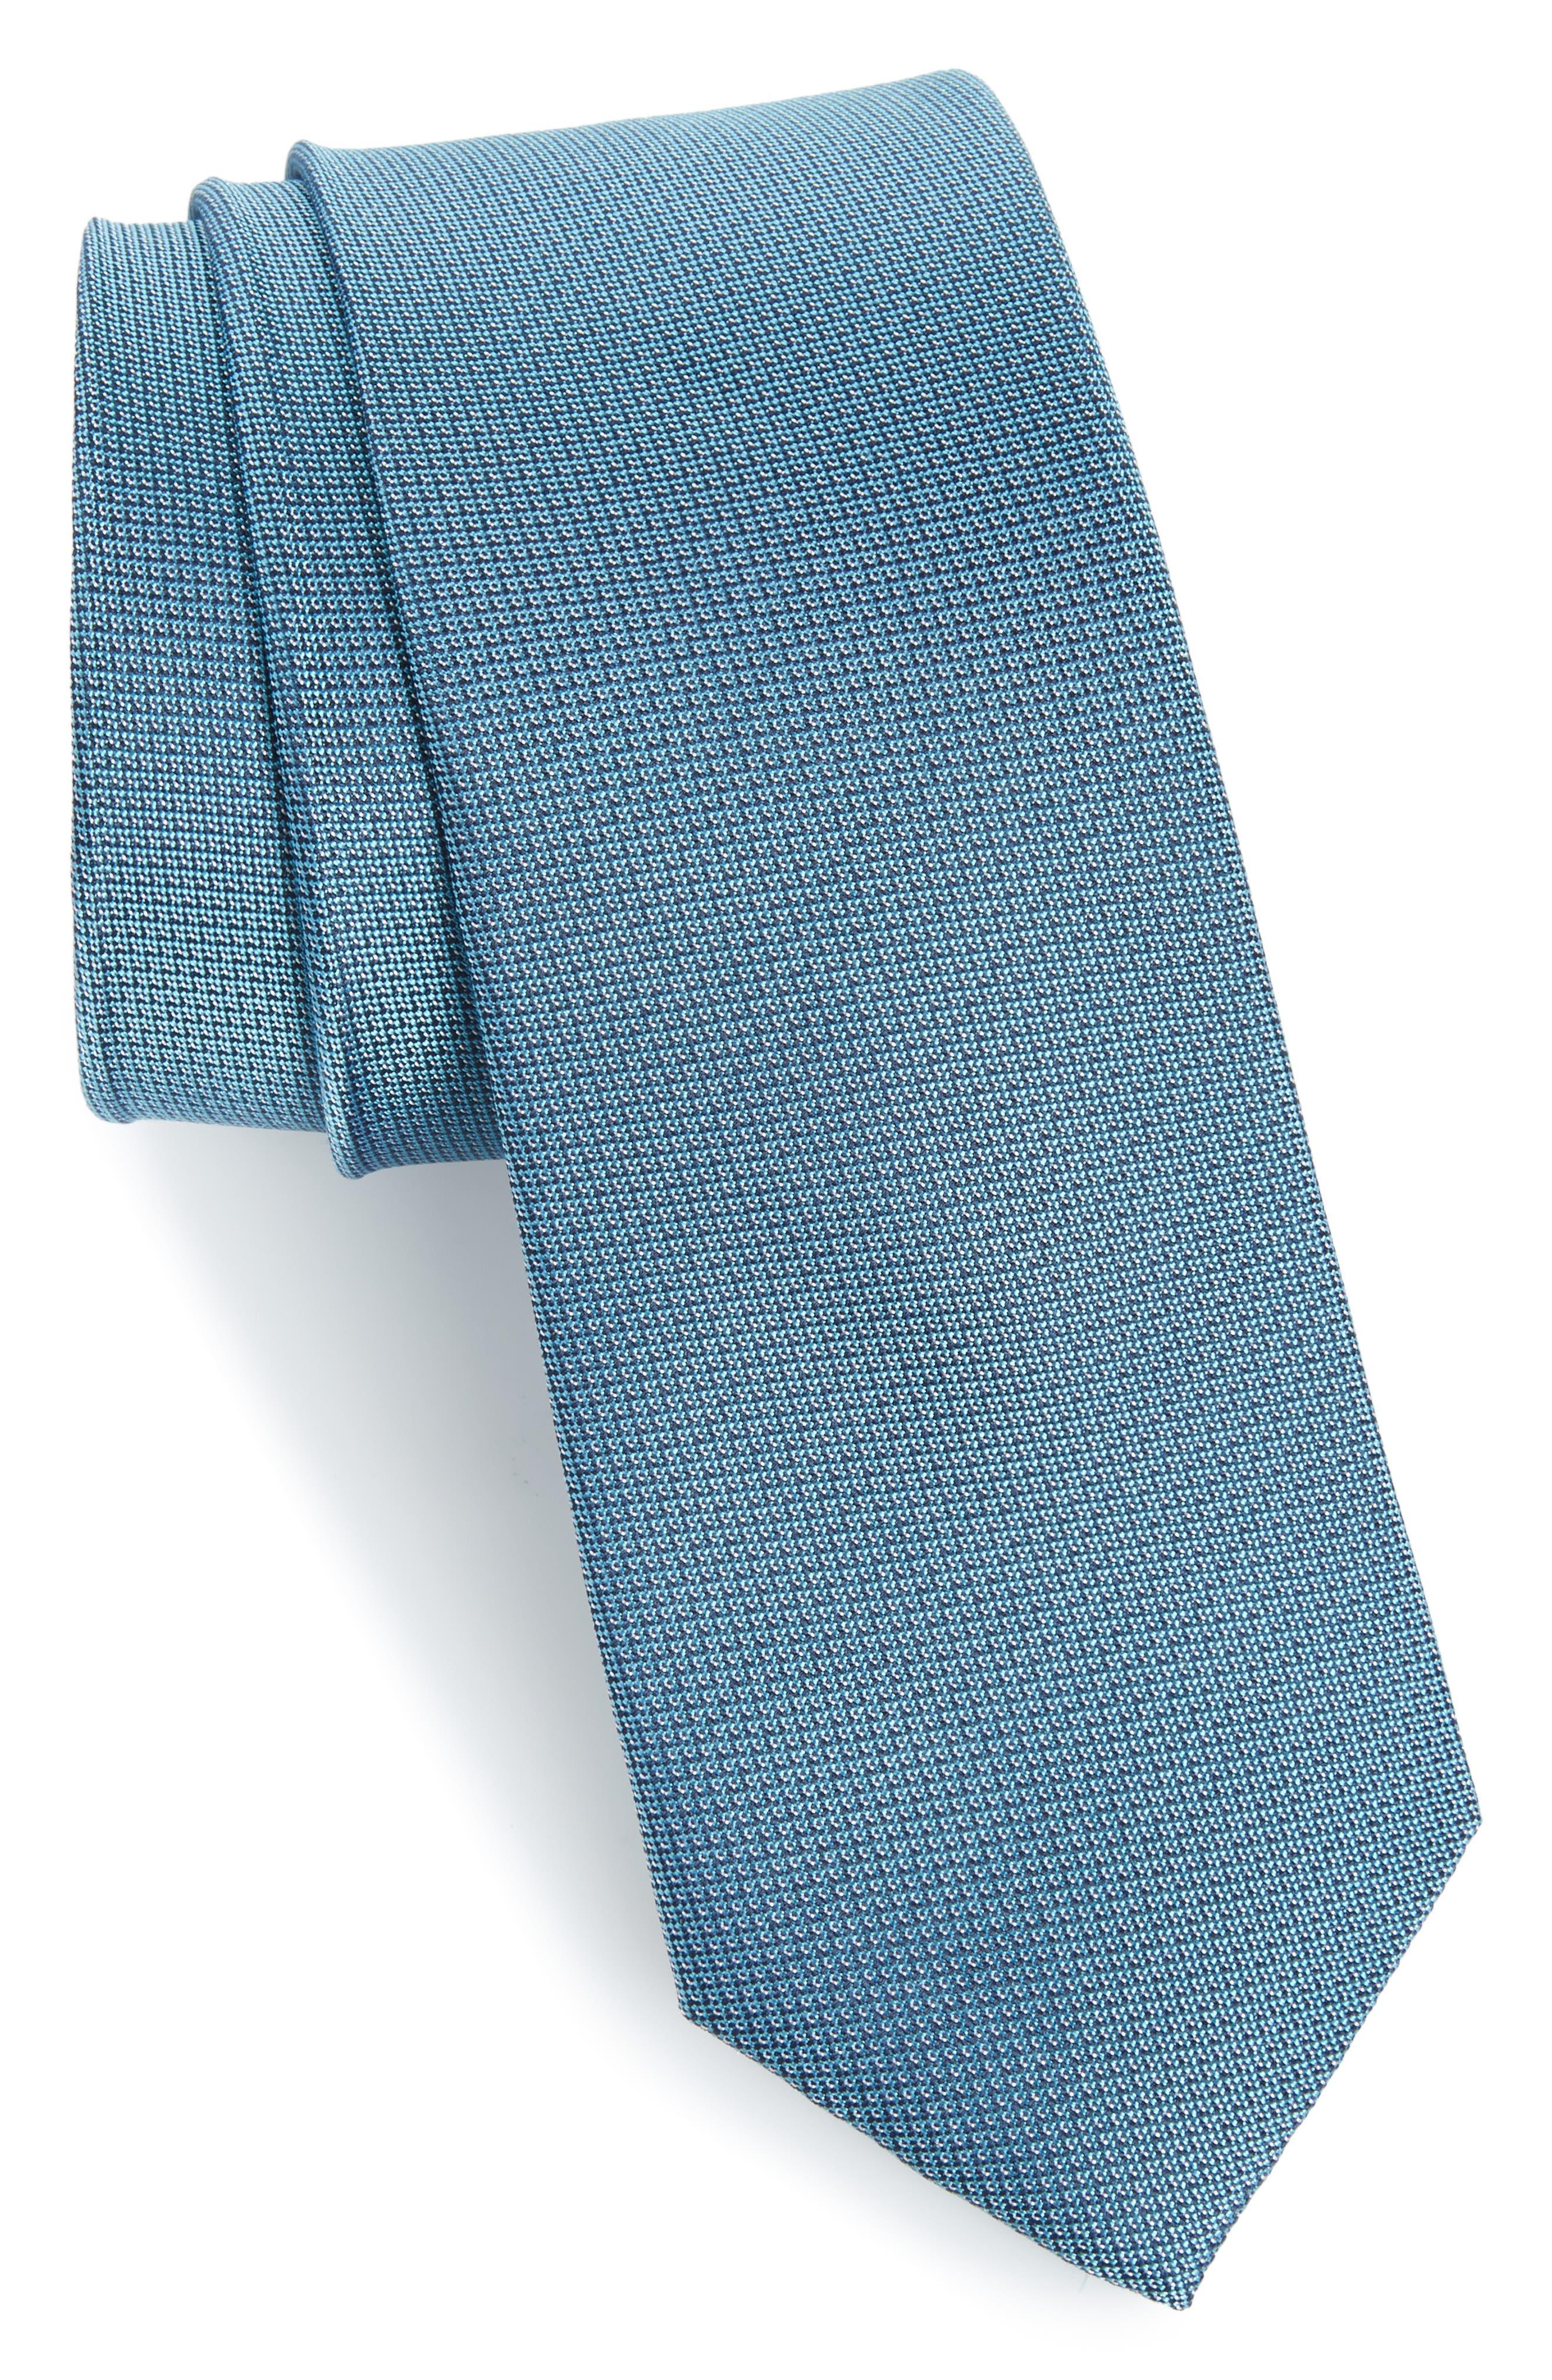 Eternity Unsolid Solid Silk Skinny Tie,                         Main,                         color, Aqua/ Teal